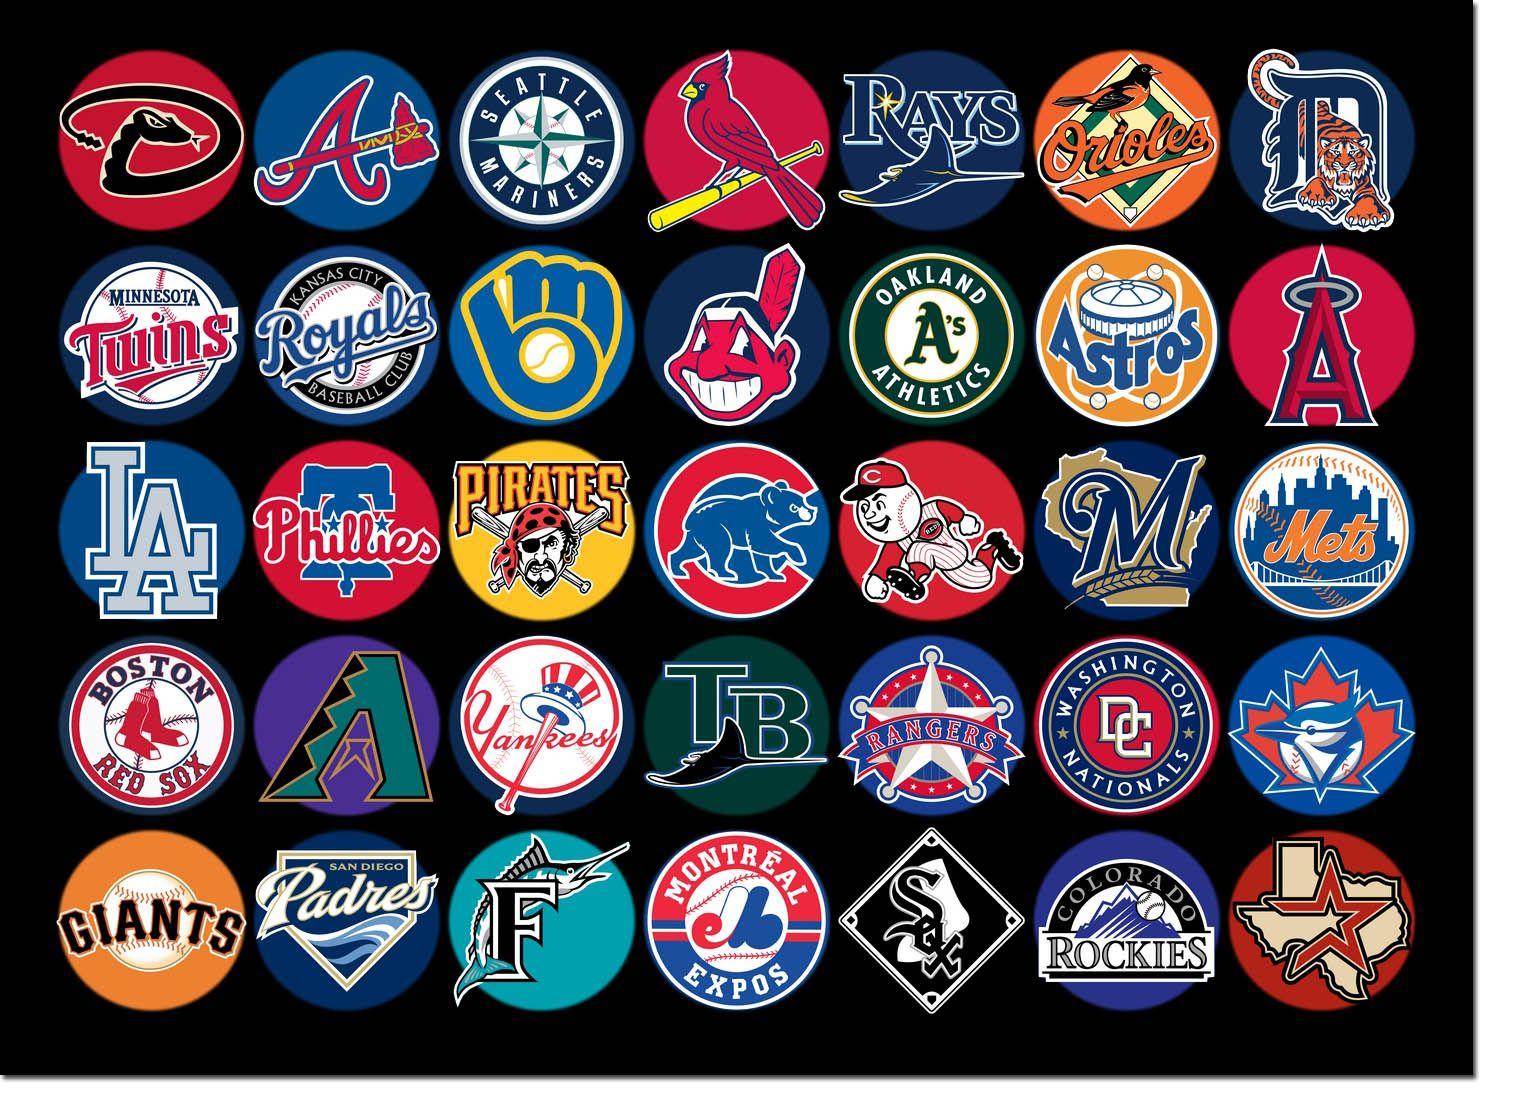 Baseball Team Logos Google Search Mlb Team Logos Baseball Teams Logo Mlb Teams